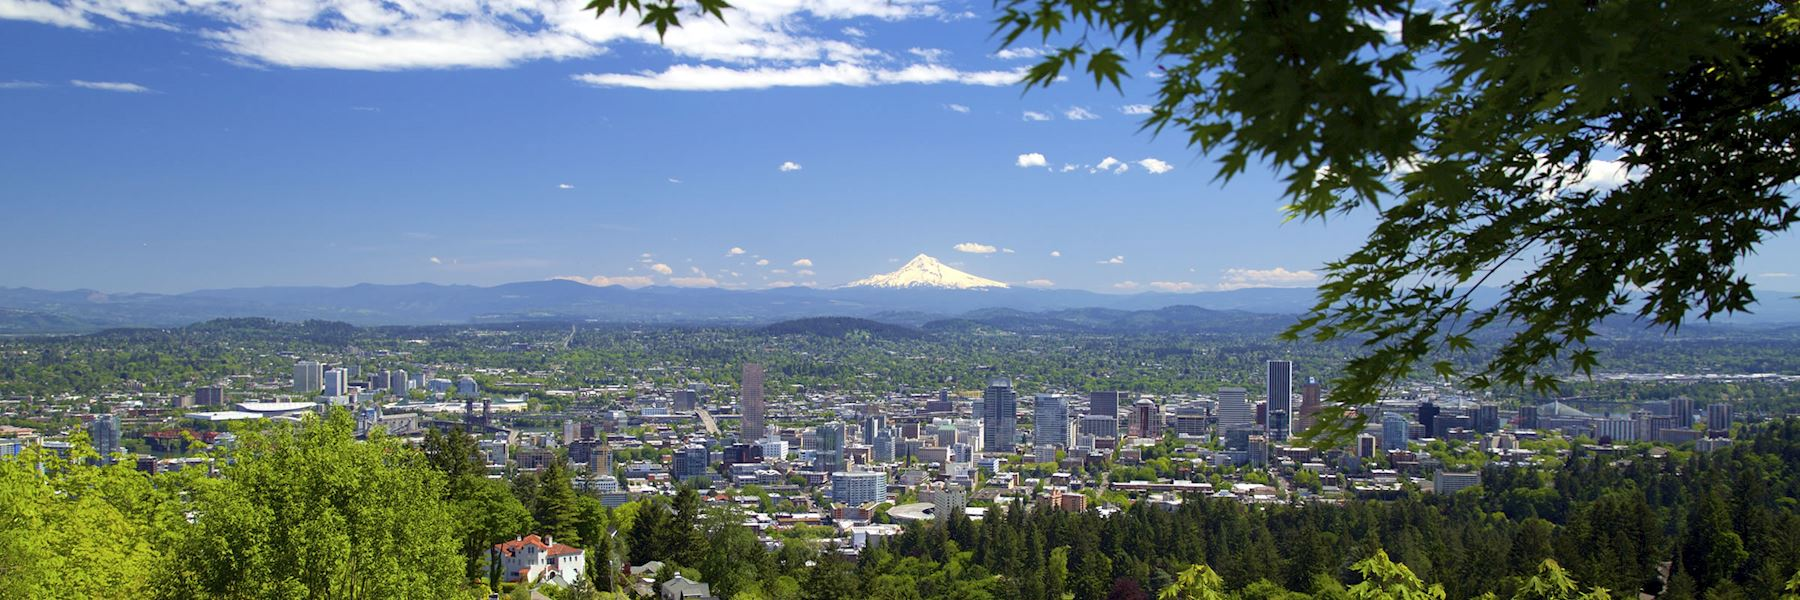 Visit Portland, USA